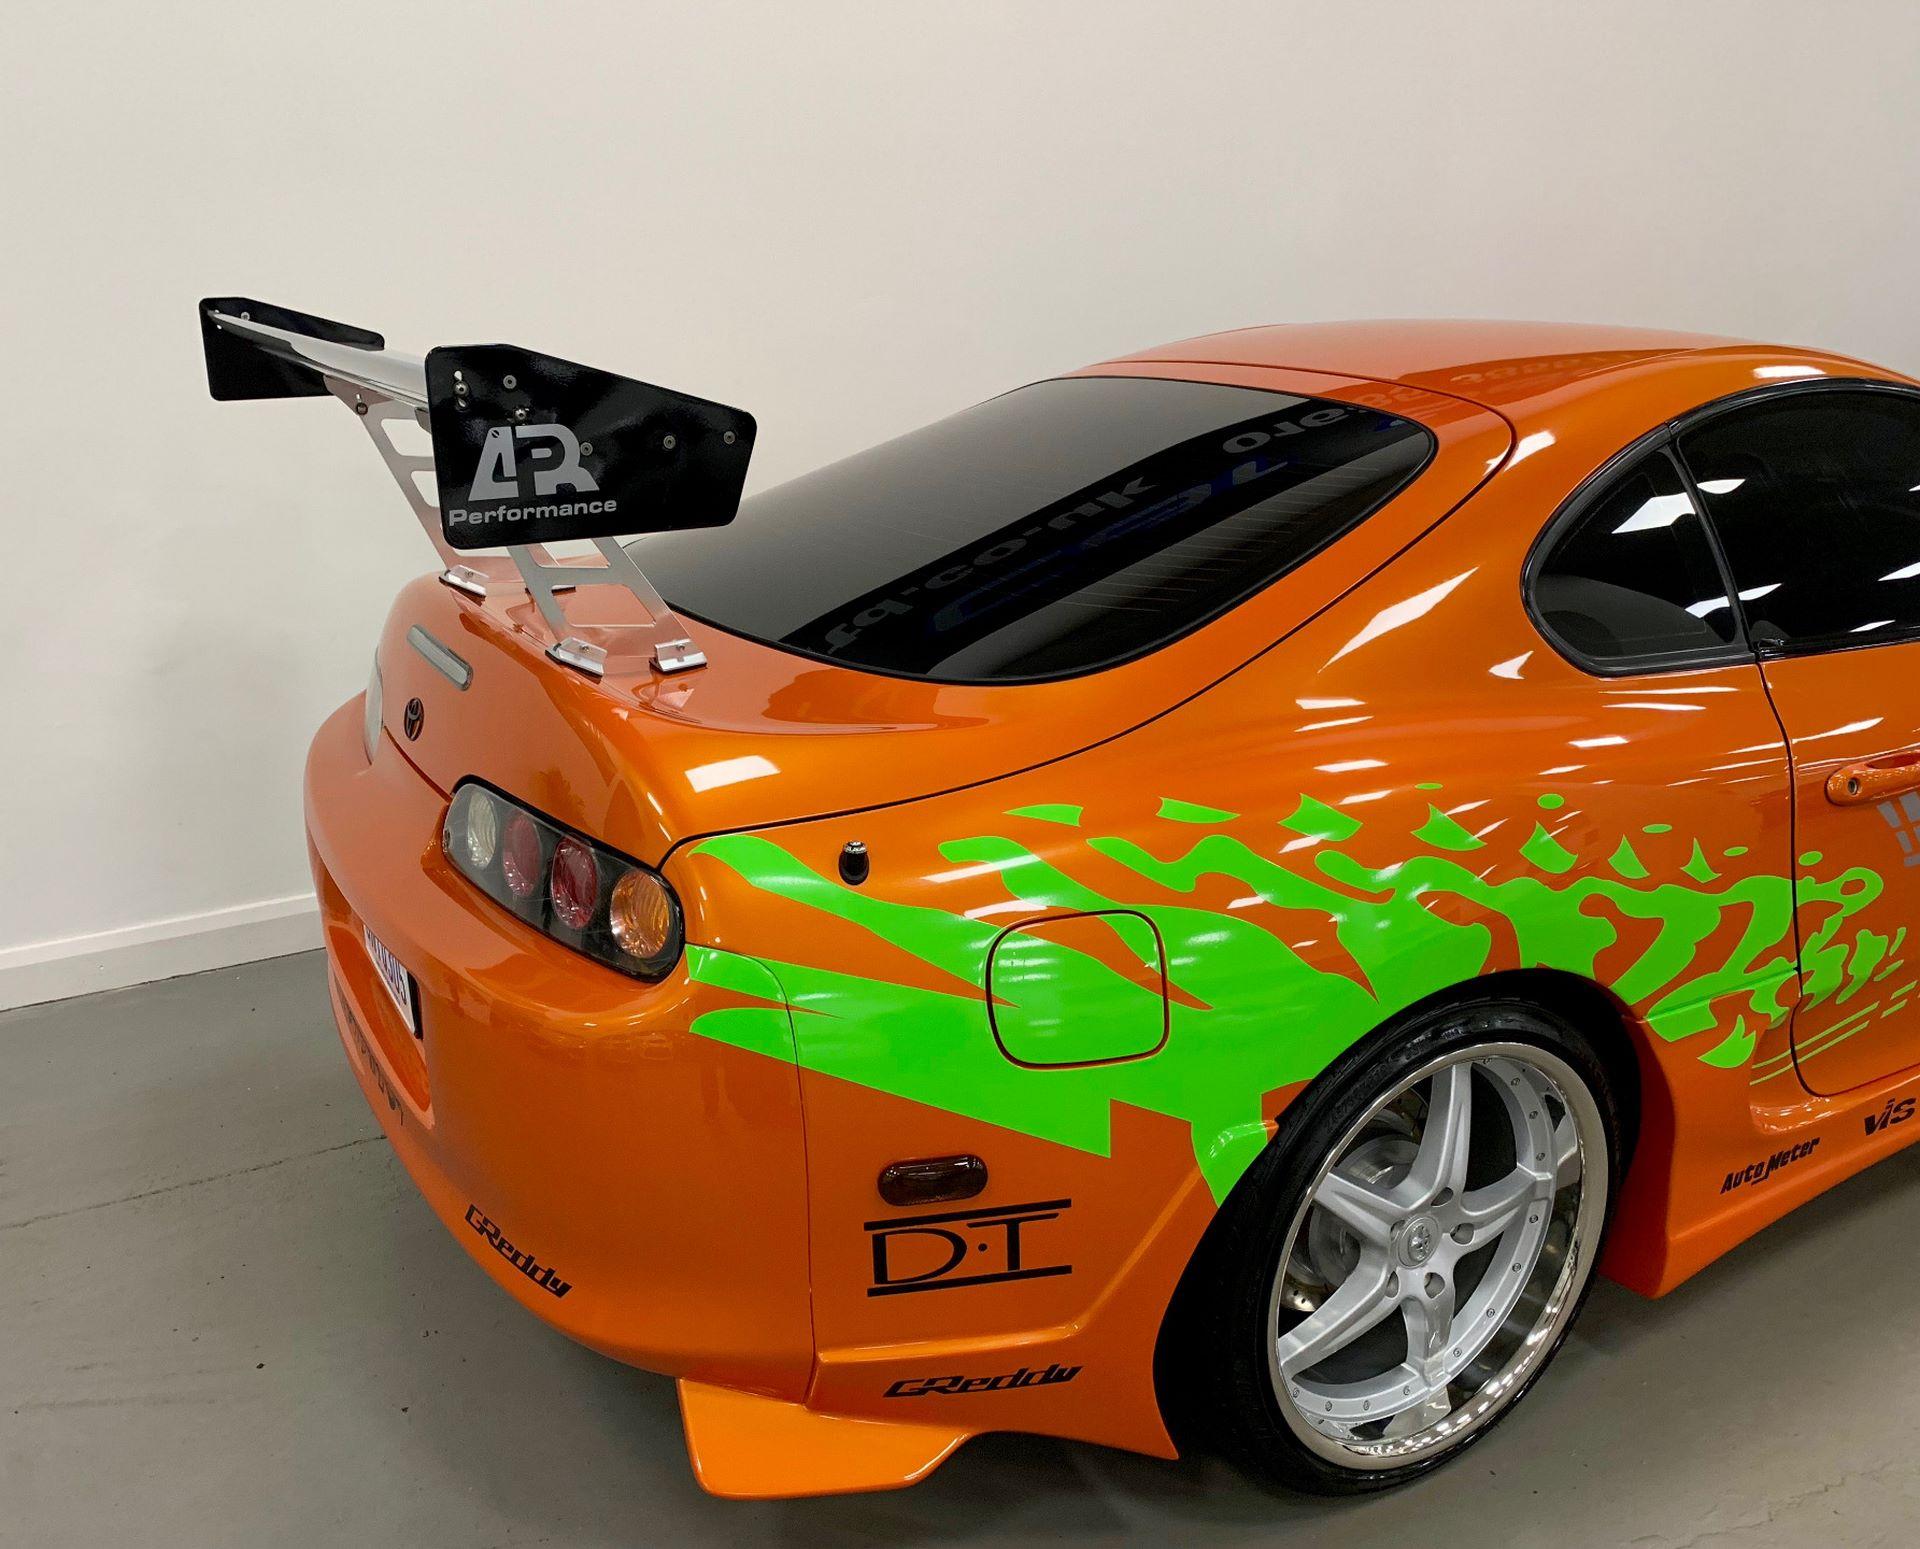 Toyota-Supra-replica-the-fast-and-the-furious-21